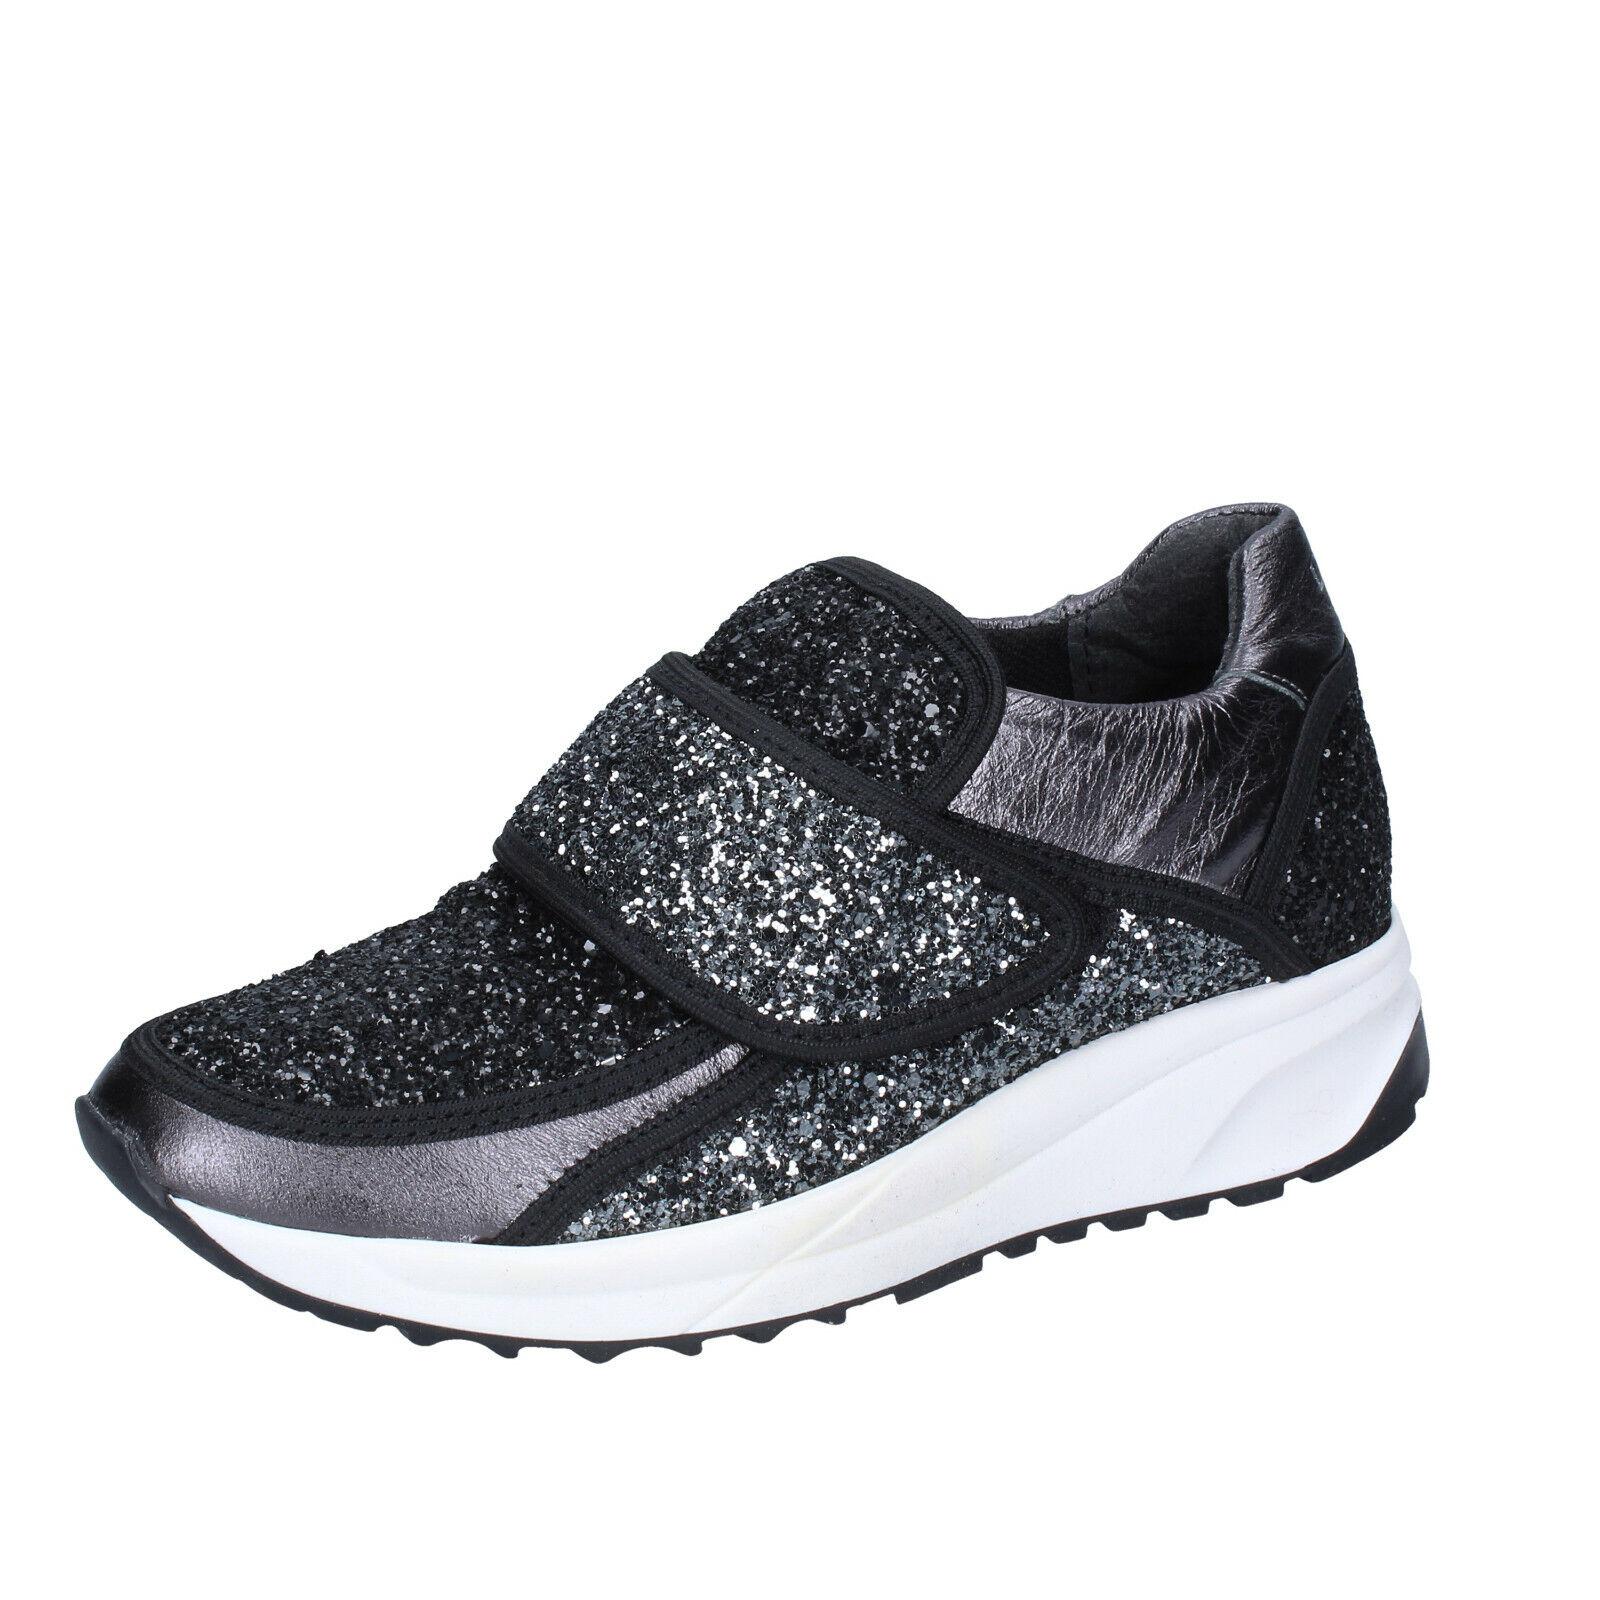 Womens shoes LIU JO 6 (EU 39) sneakers black grey glitter BS606-39